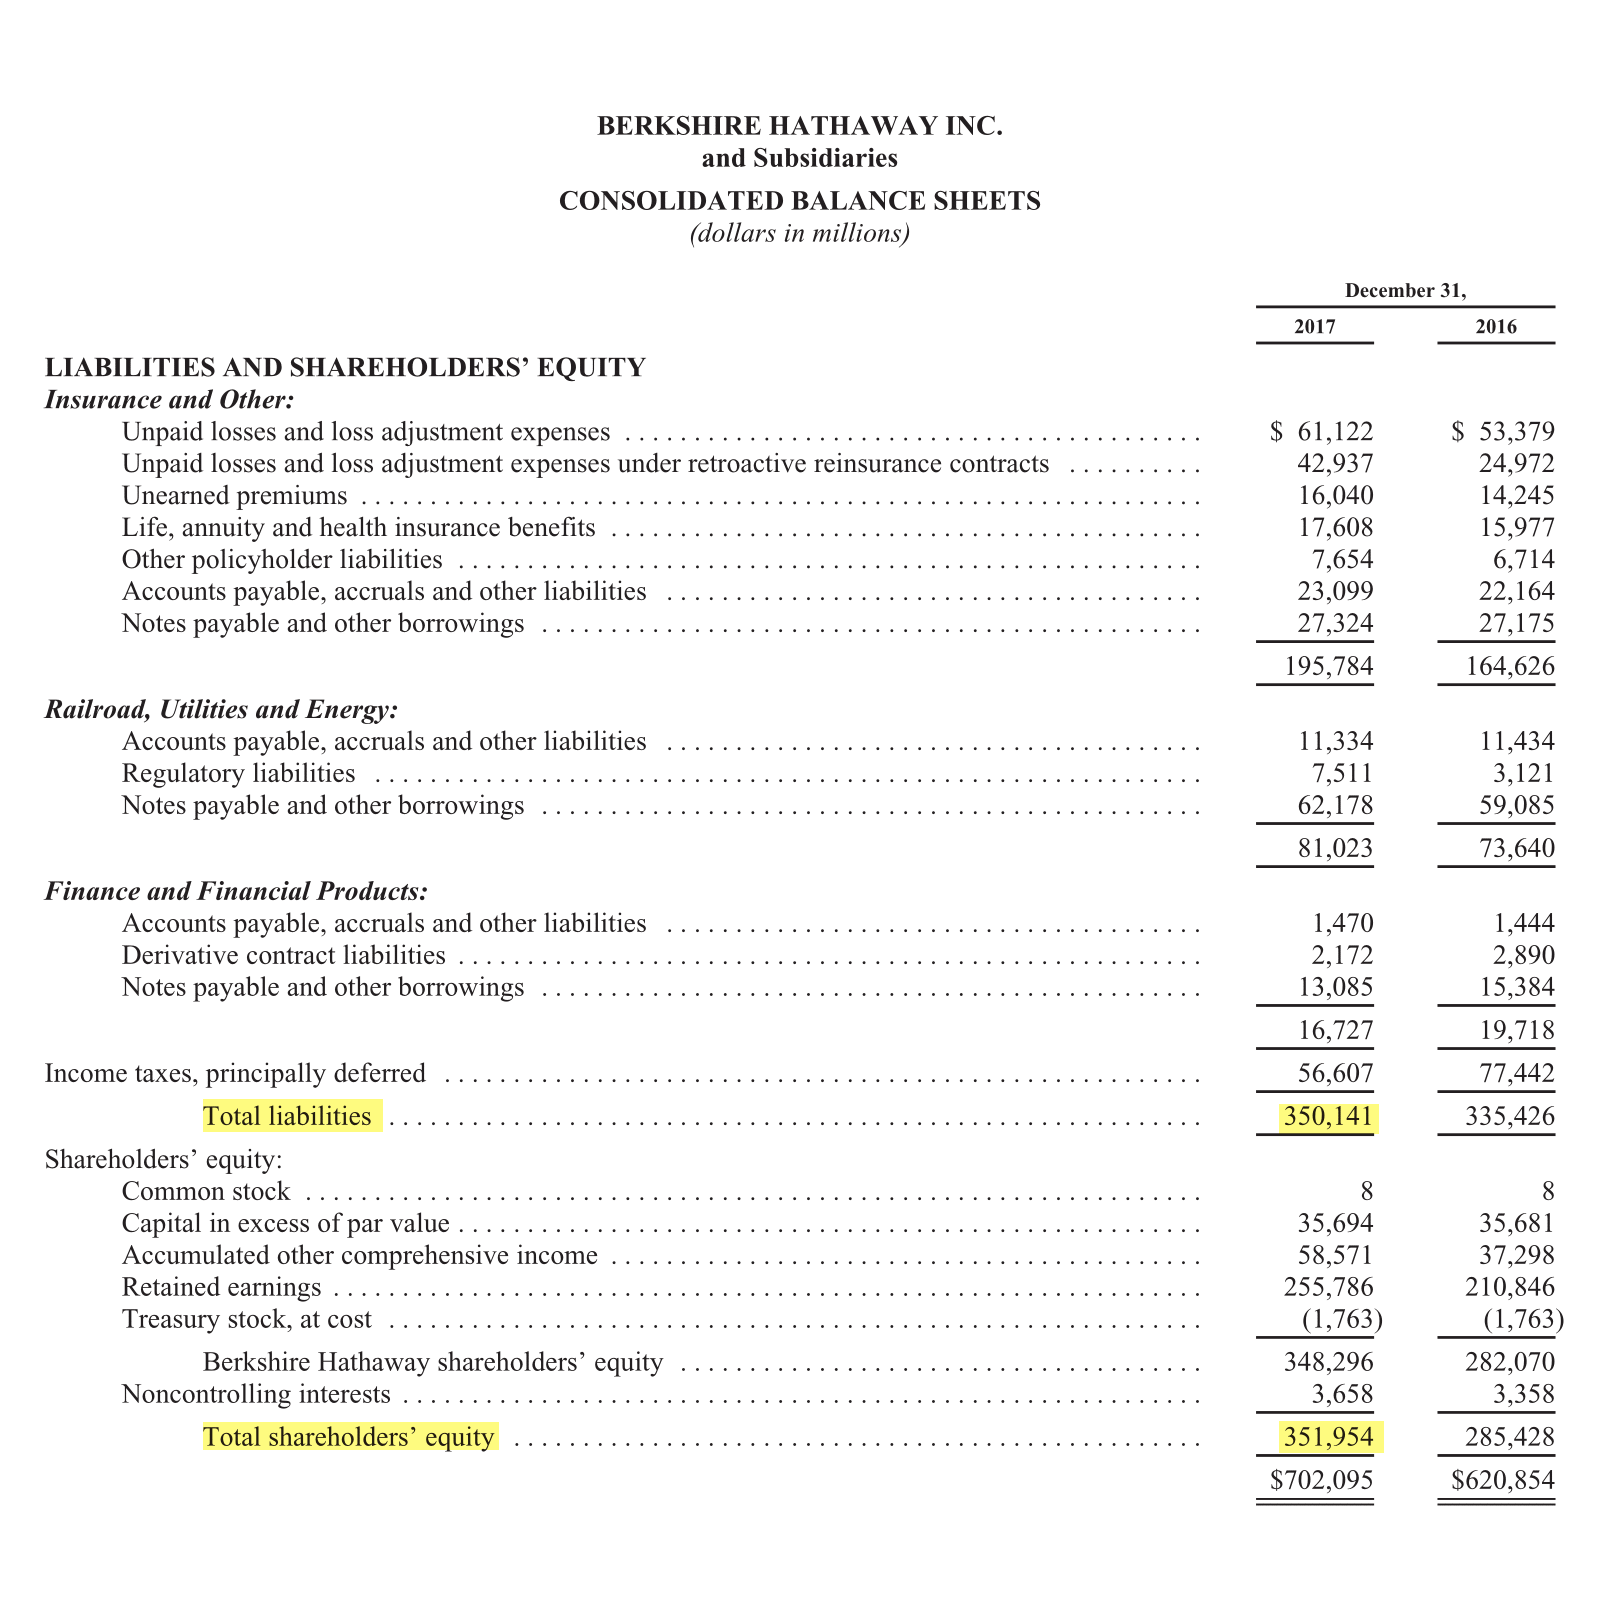 Страница 95 годового отчета Berkshire Hathaway за 2017 год